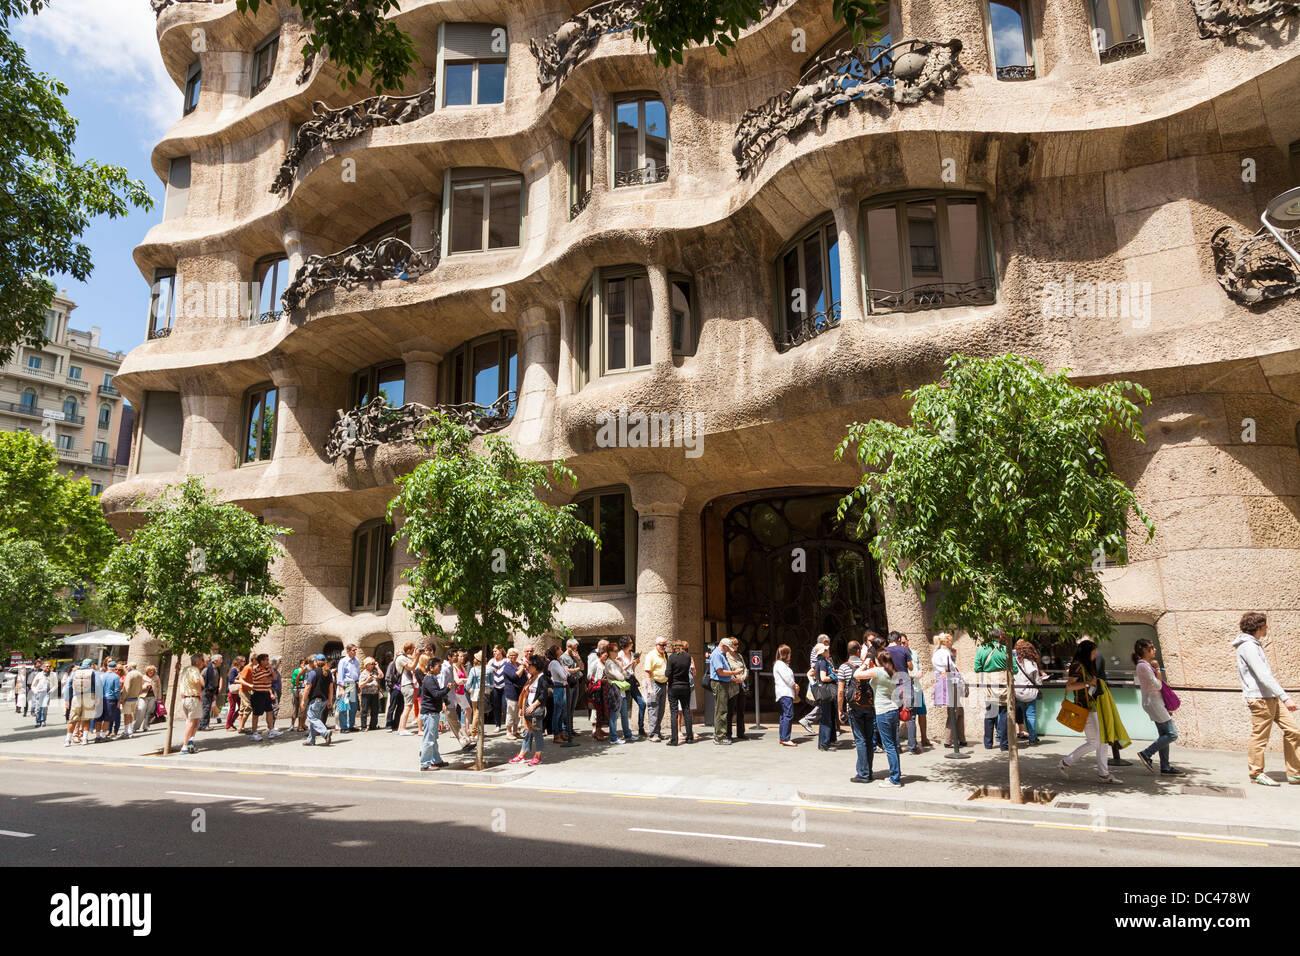 visitors queuing outside La Pedrera in Barcelona - Stock Image